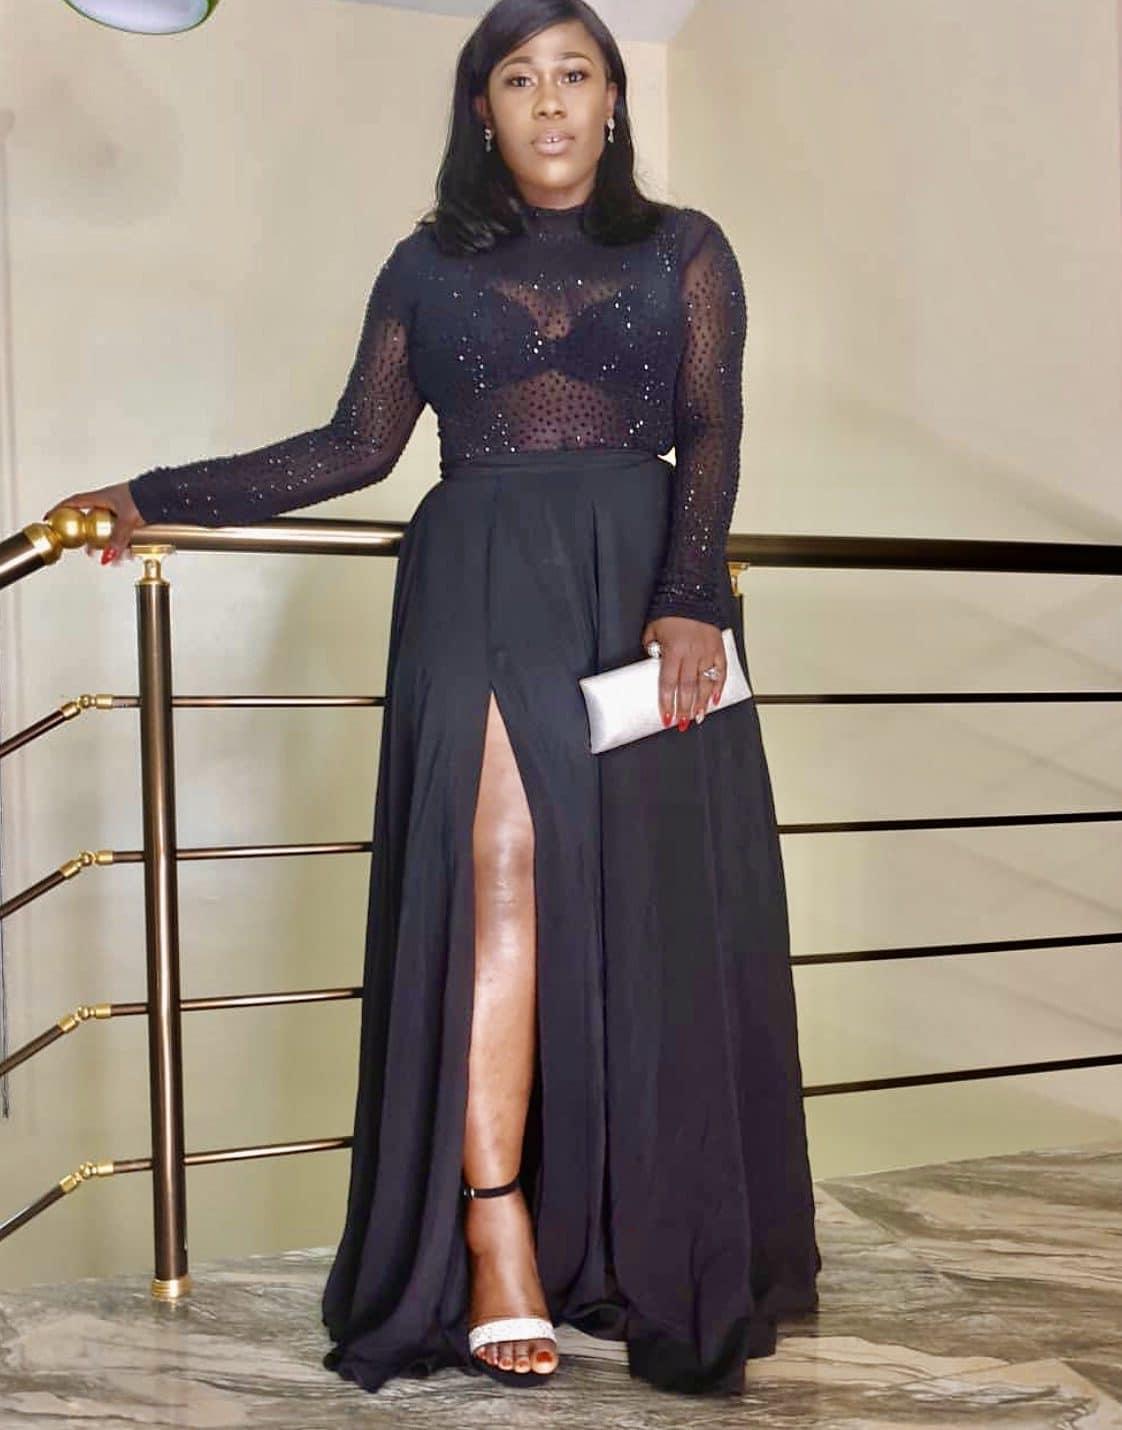 uche-jombo-nigerian-celebrity-style-dresses